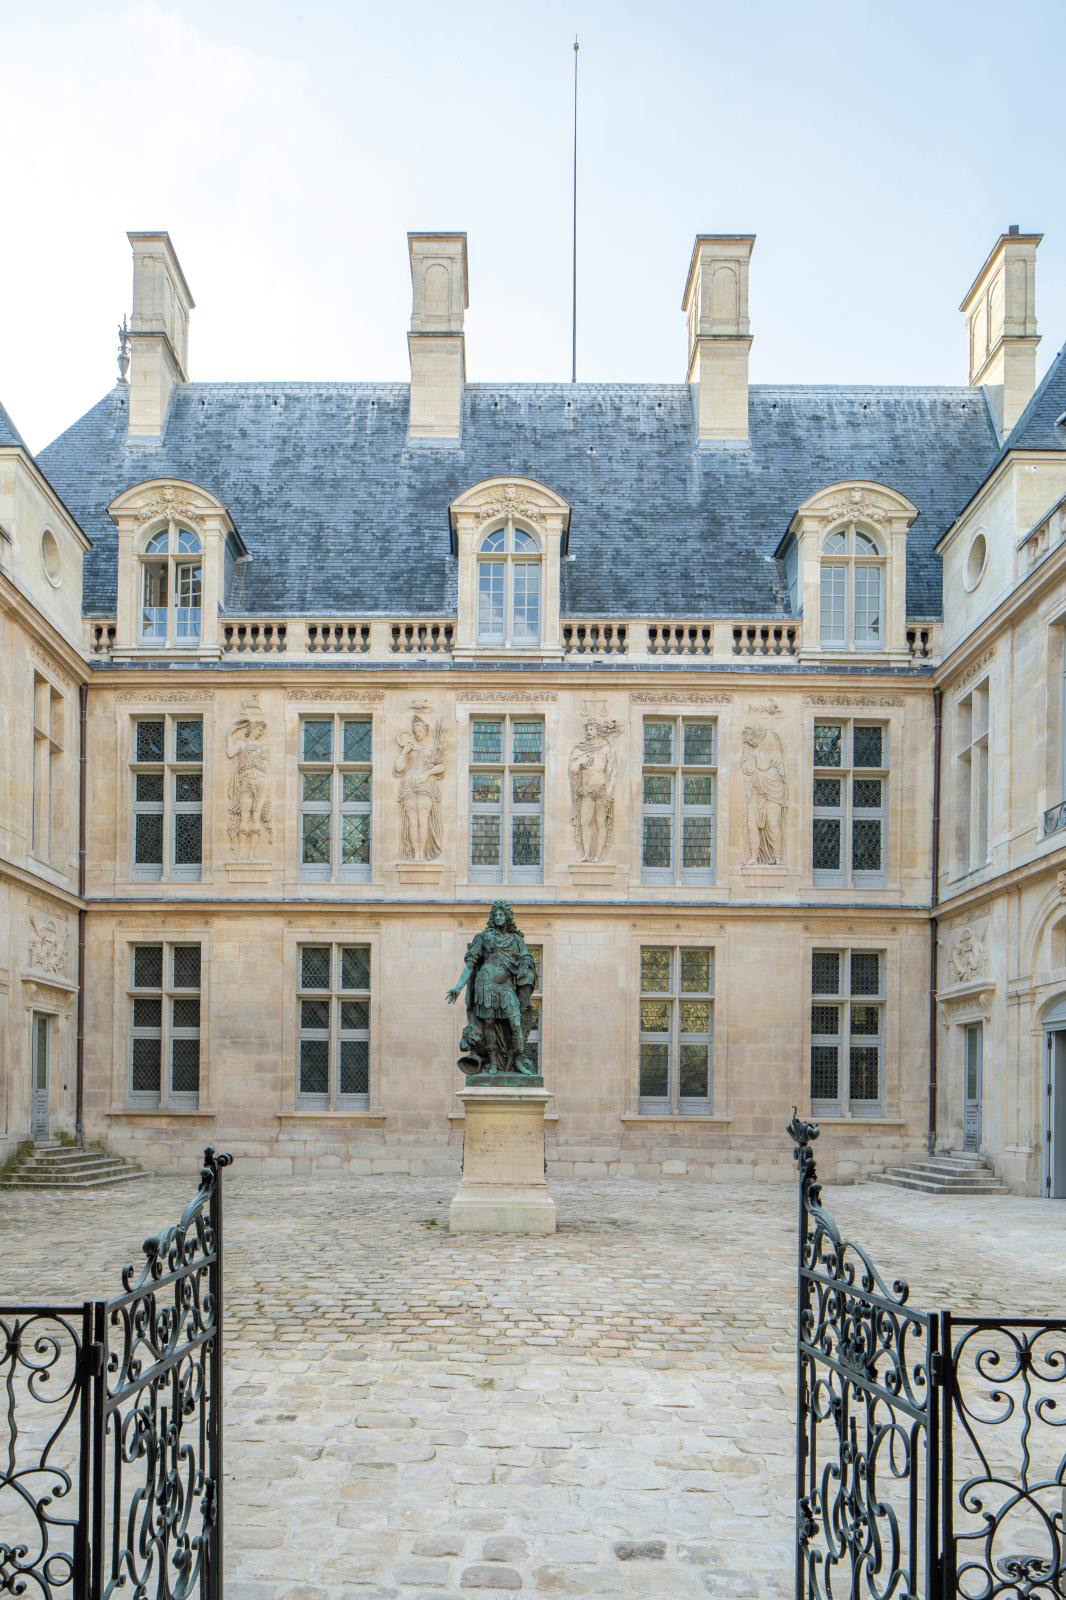 The main courtyard of the Musée Carnavalet.Musée Carnavalet - Histoire de Paris © Antoine Mercusot